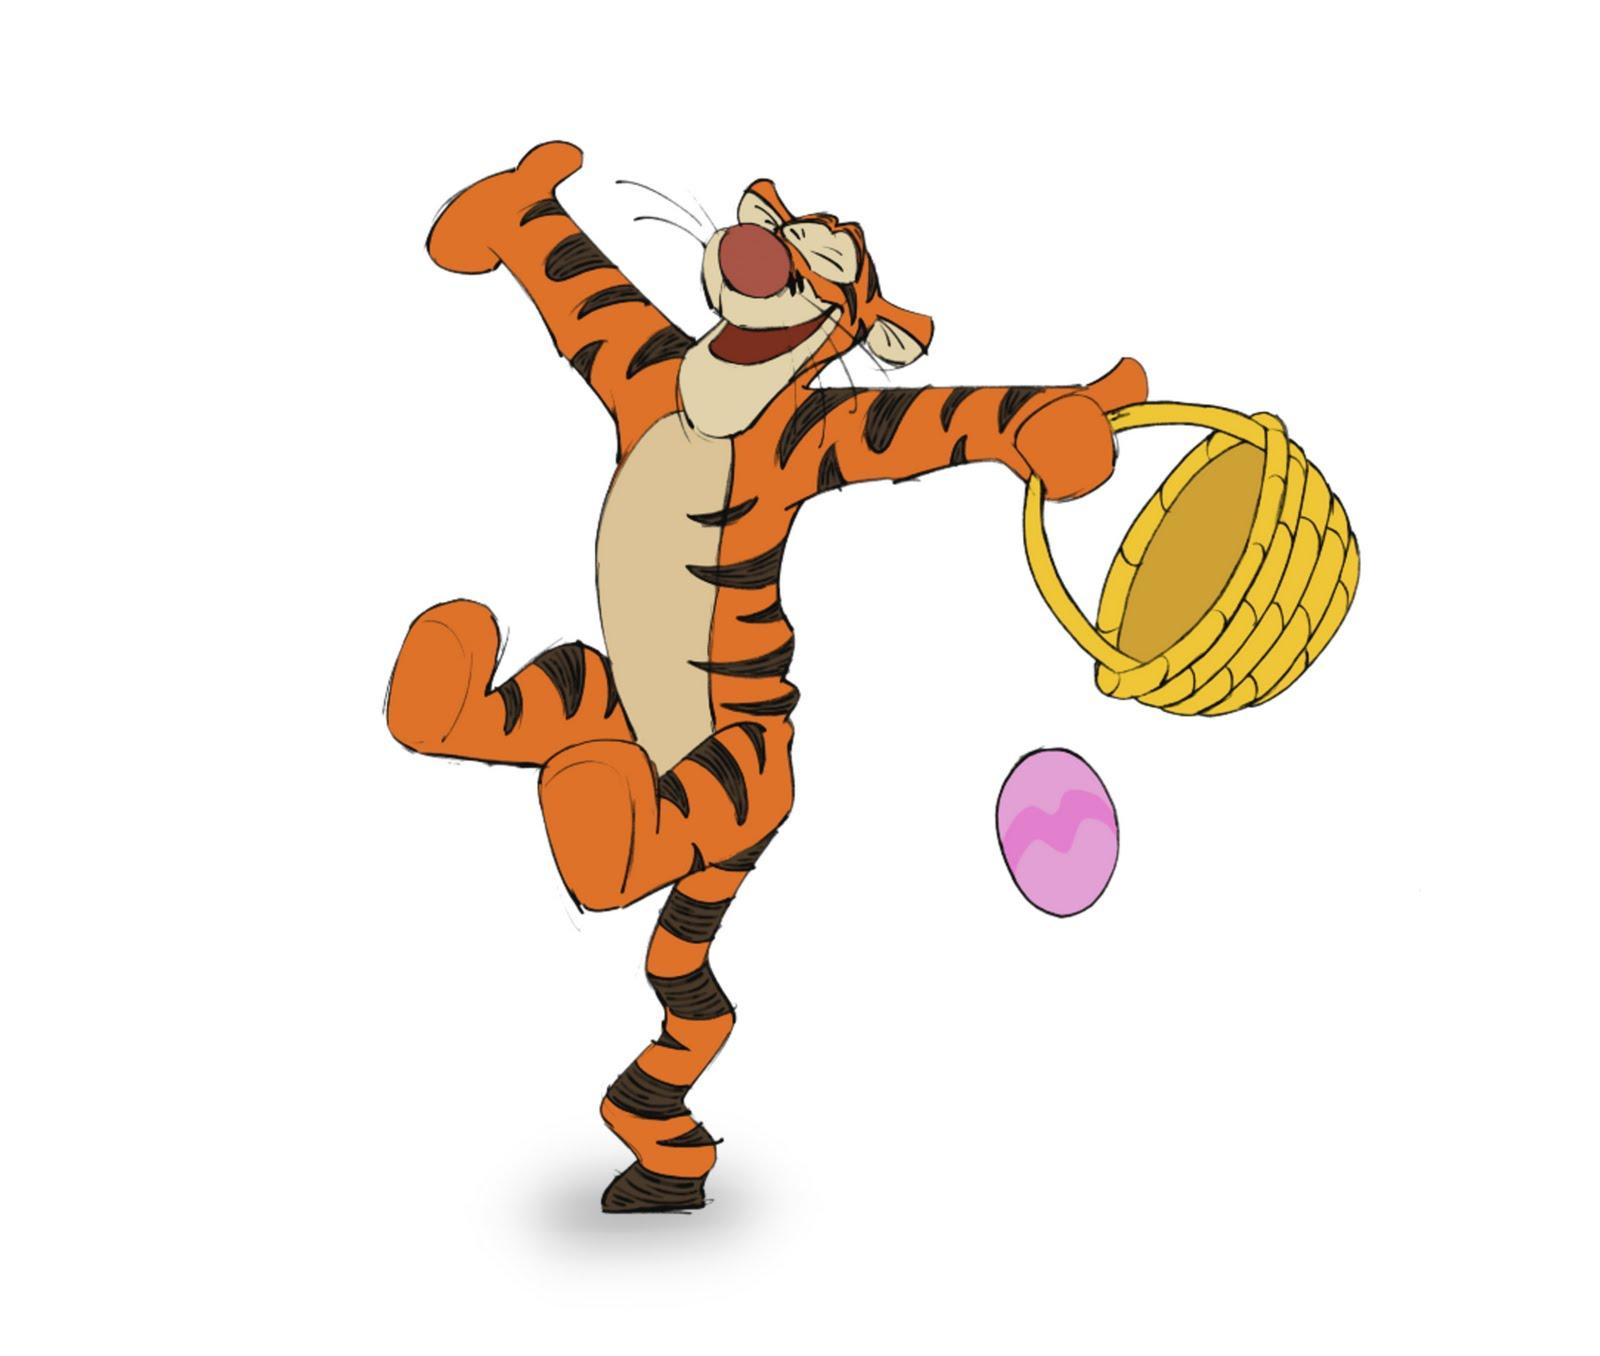 Tigger Easter dirimg | Tiggers Are Wonderful Things!!! | Pinterest ...